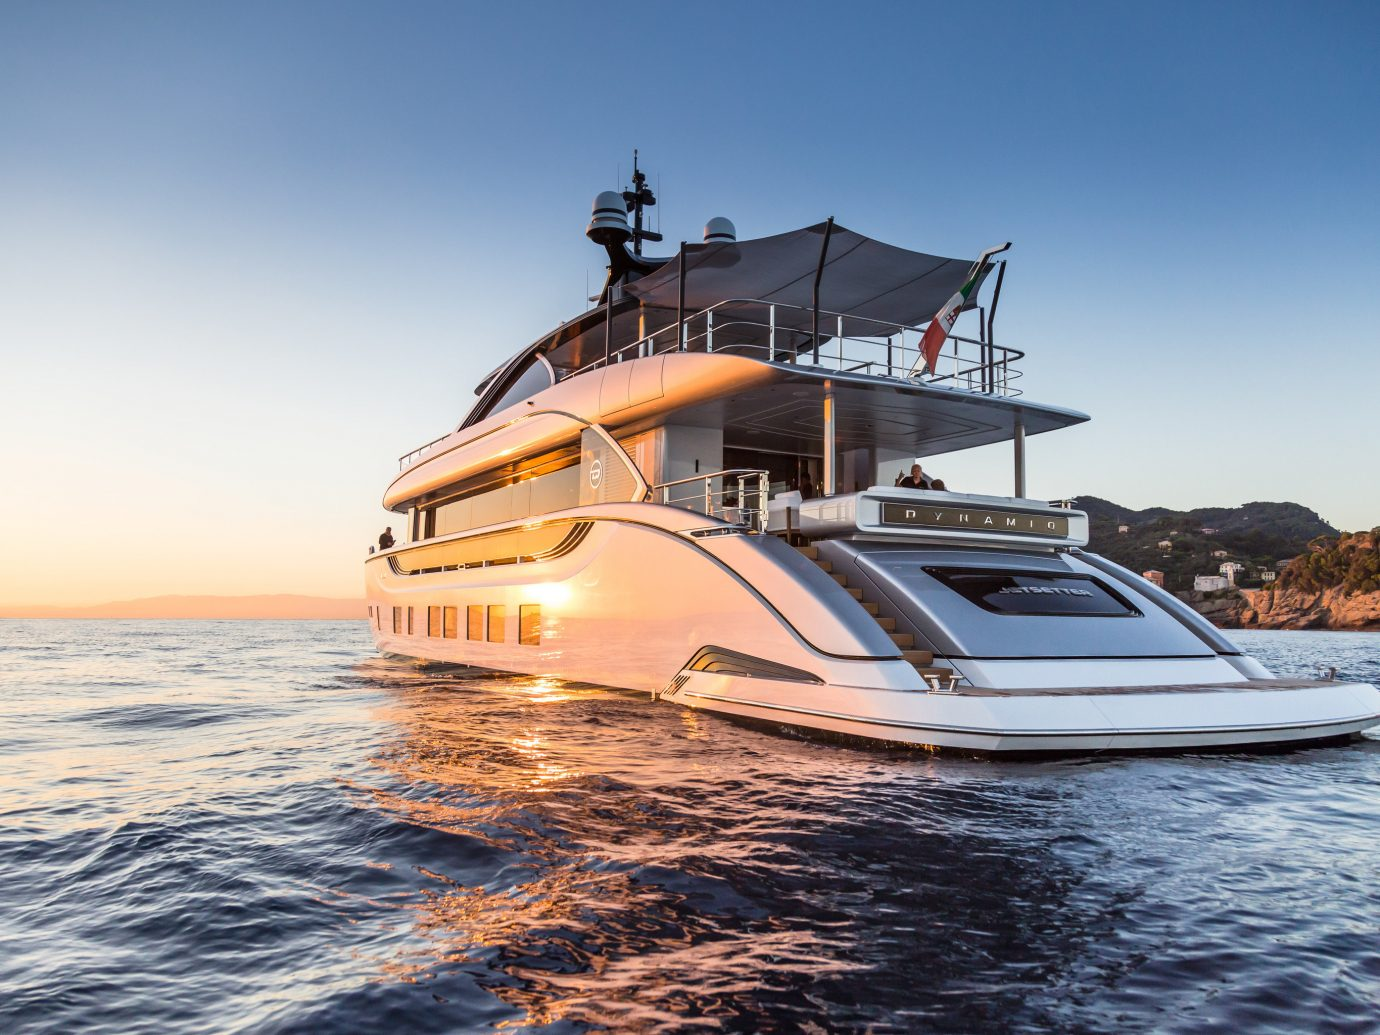 Luxury Travel Trip Ideas sky water outdoor Boat vehicle luxury yacht passenger ship ship motor ship yacht ecosystem watercraft Sea motorboat boating